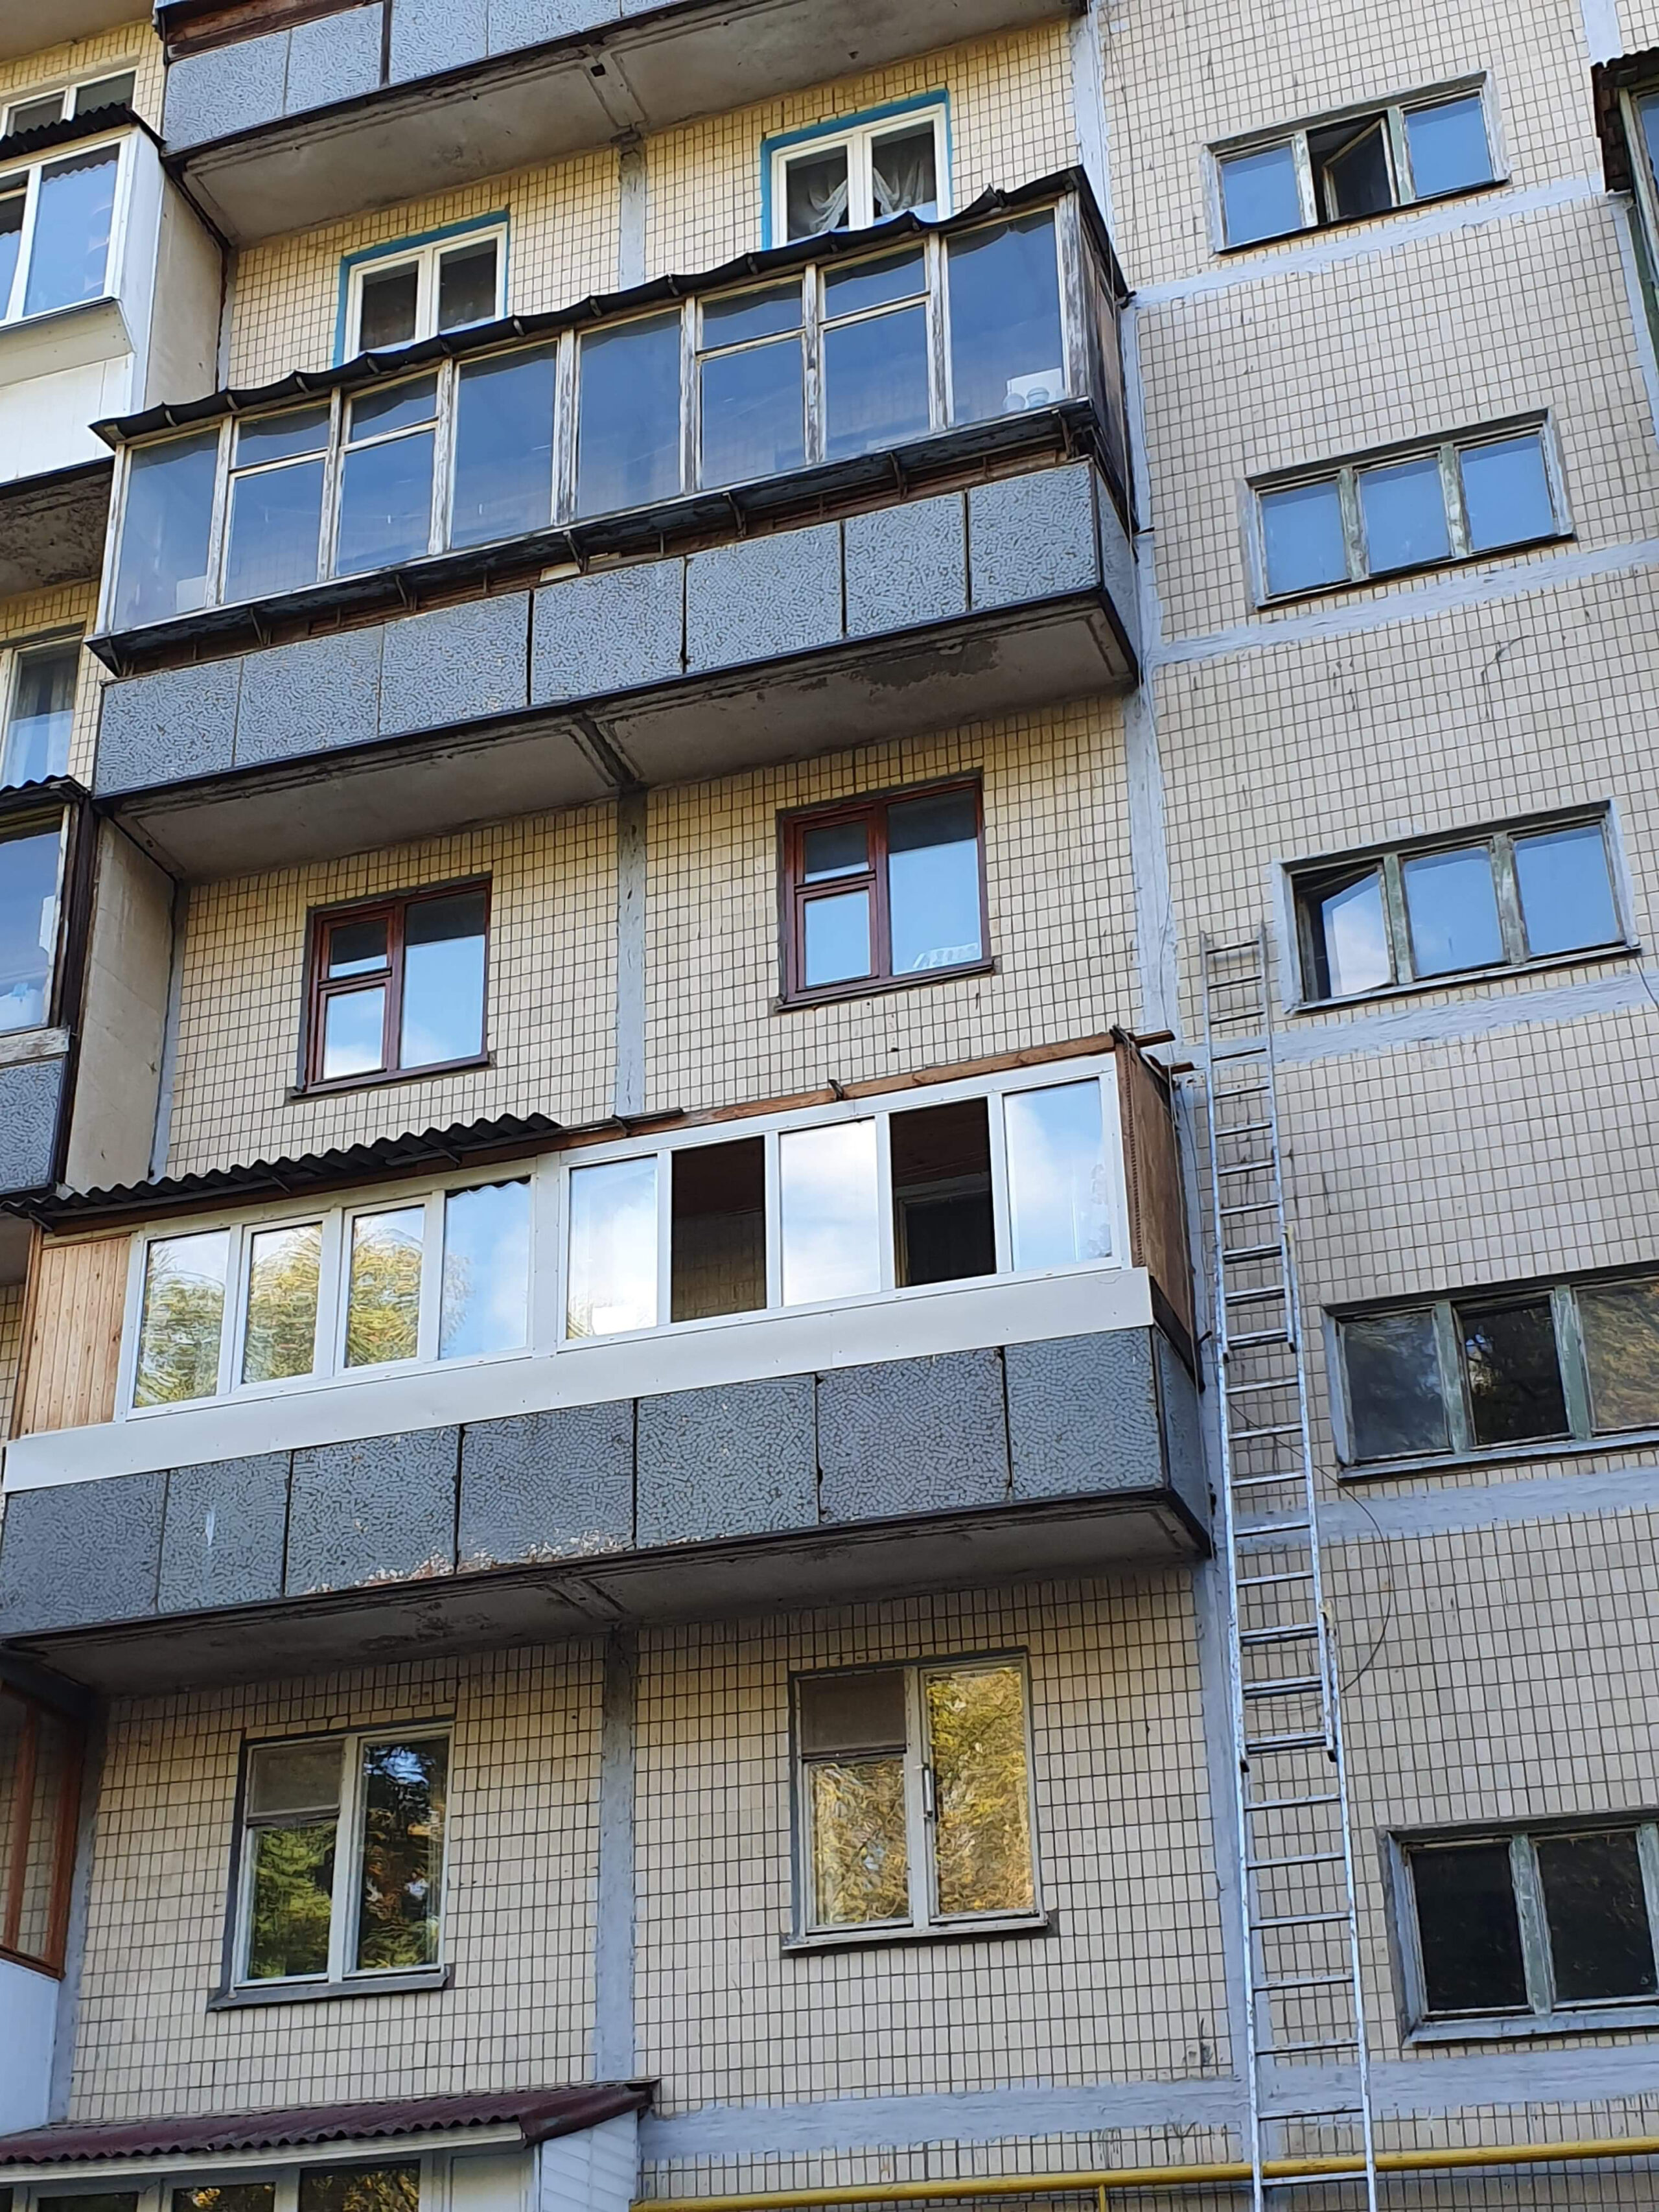 vashfasad-uteplenie-kvartir68